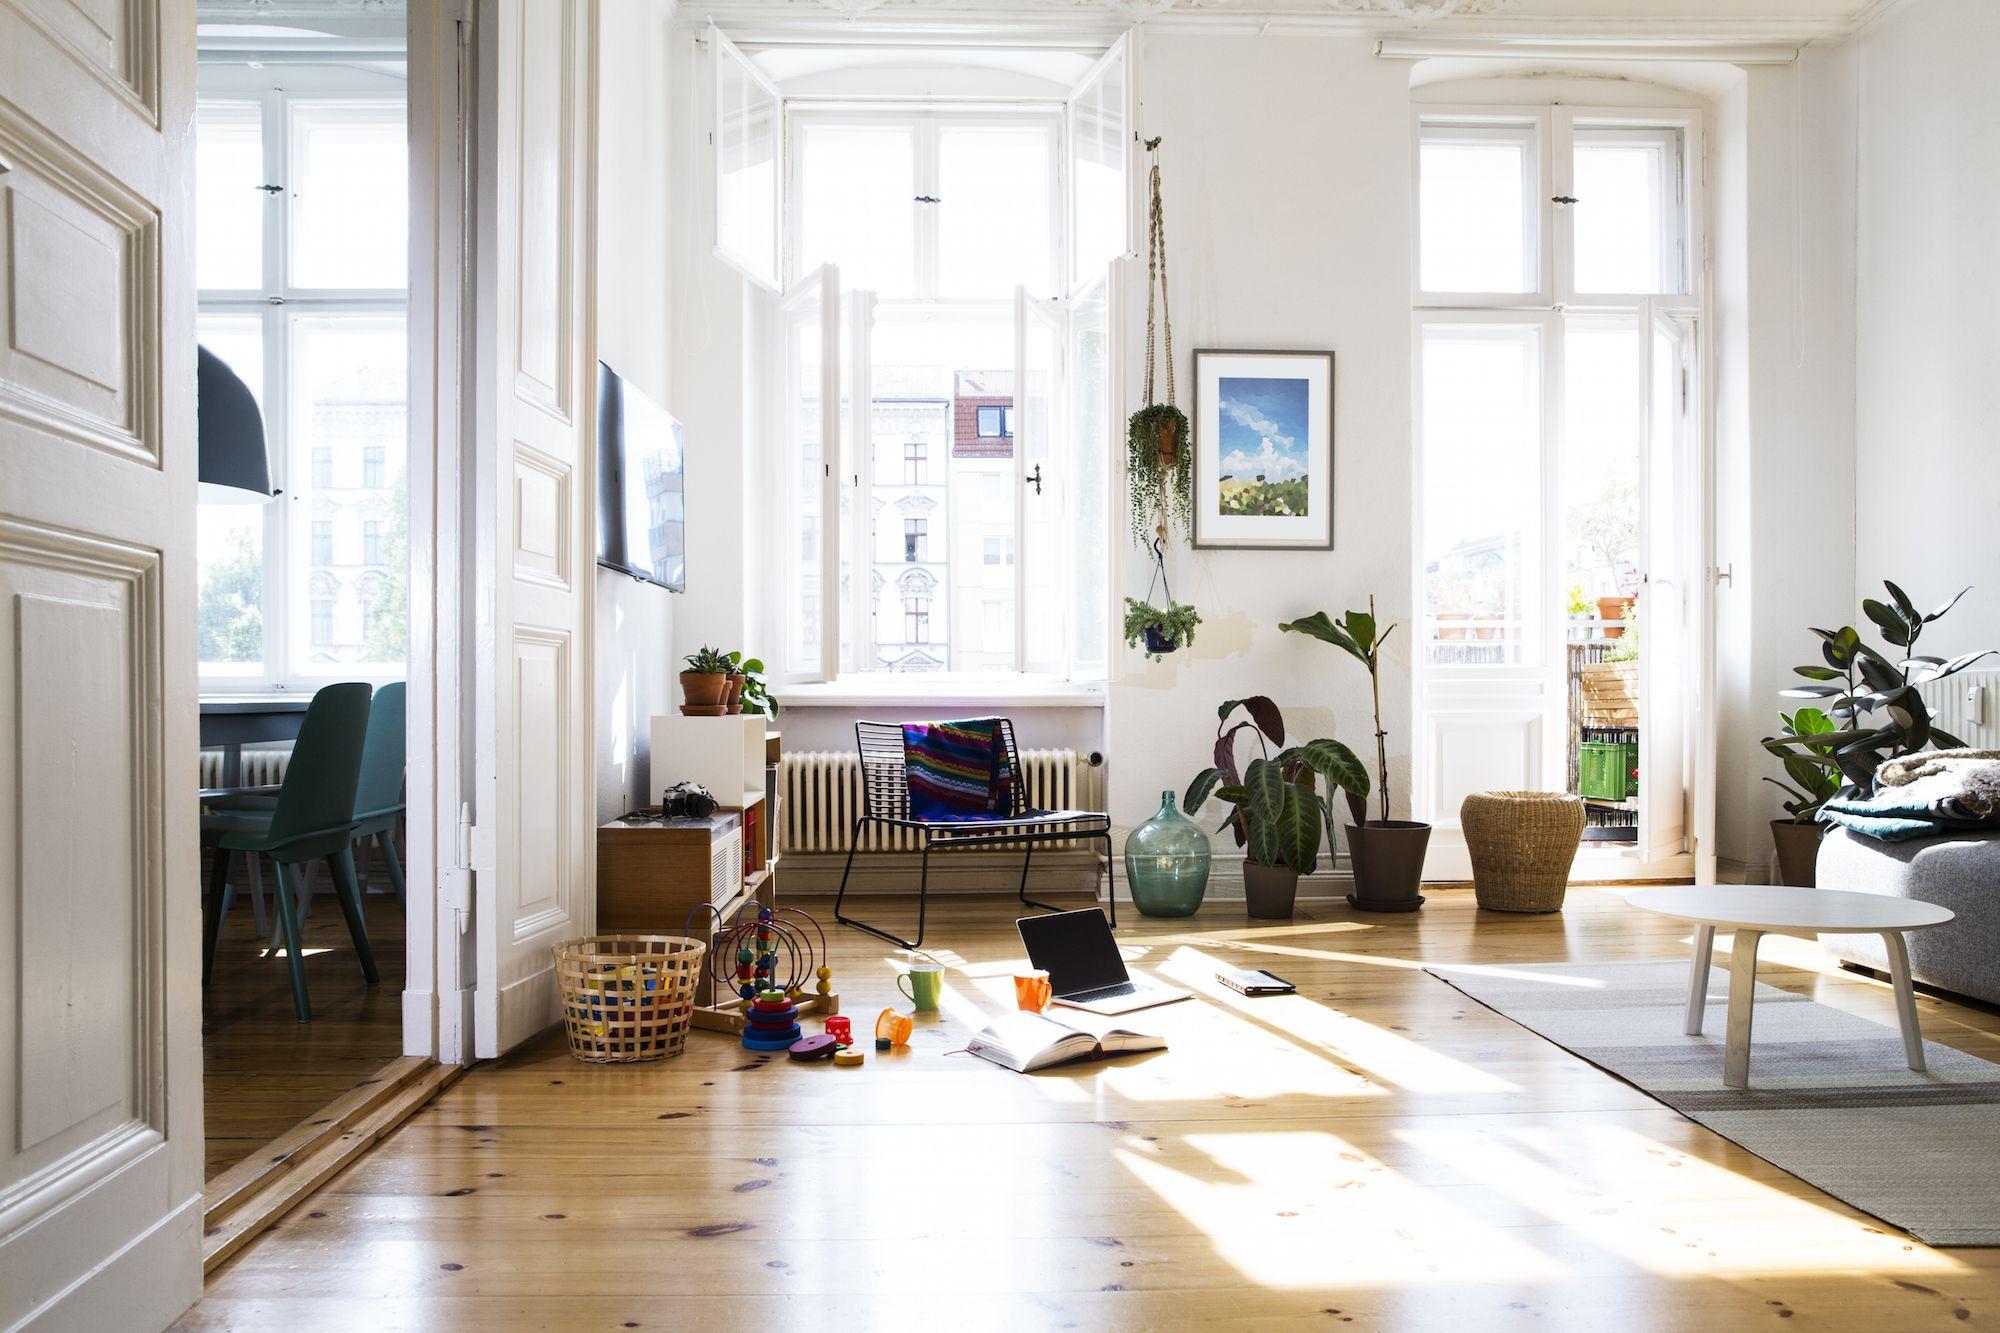 Delightful Living Room Vs Family Room. Getty Images